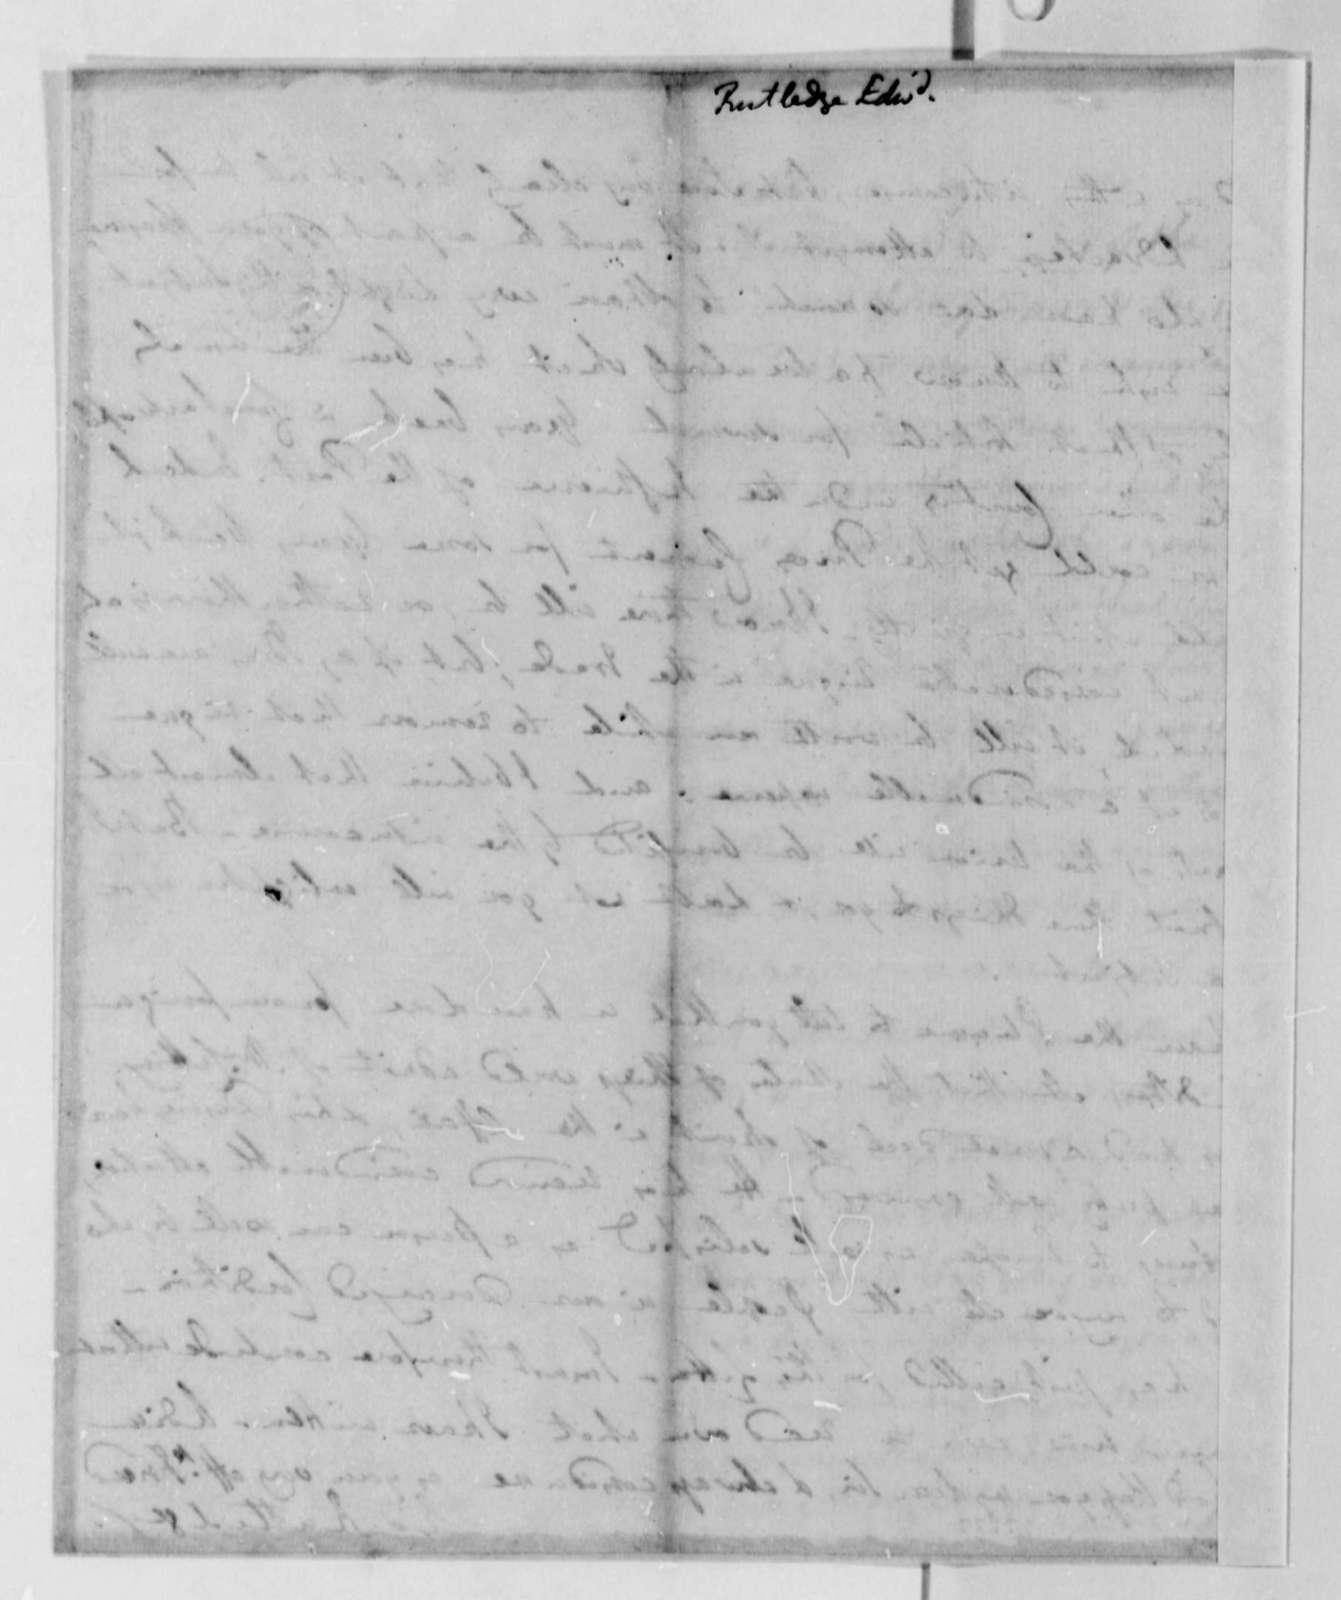 Edward Rutledge to Thomas Jefferson, May 1789